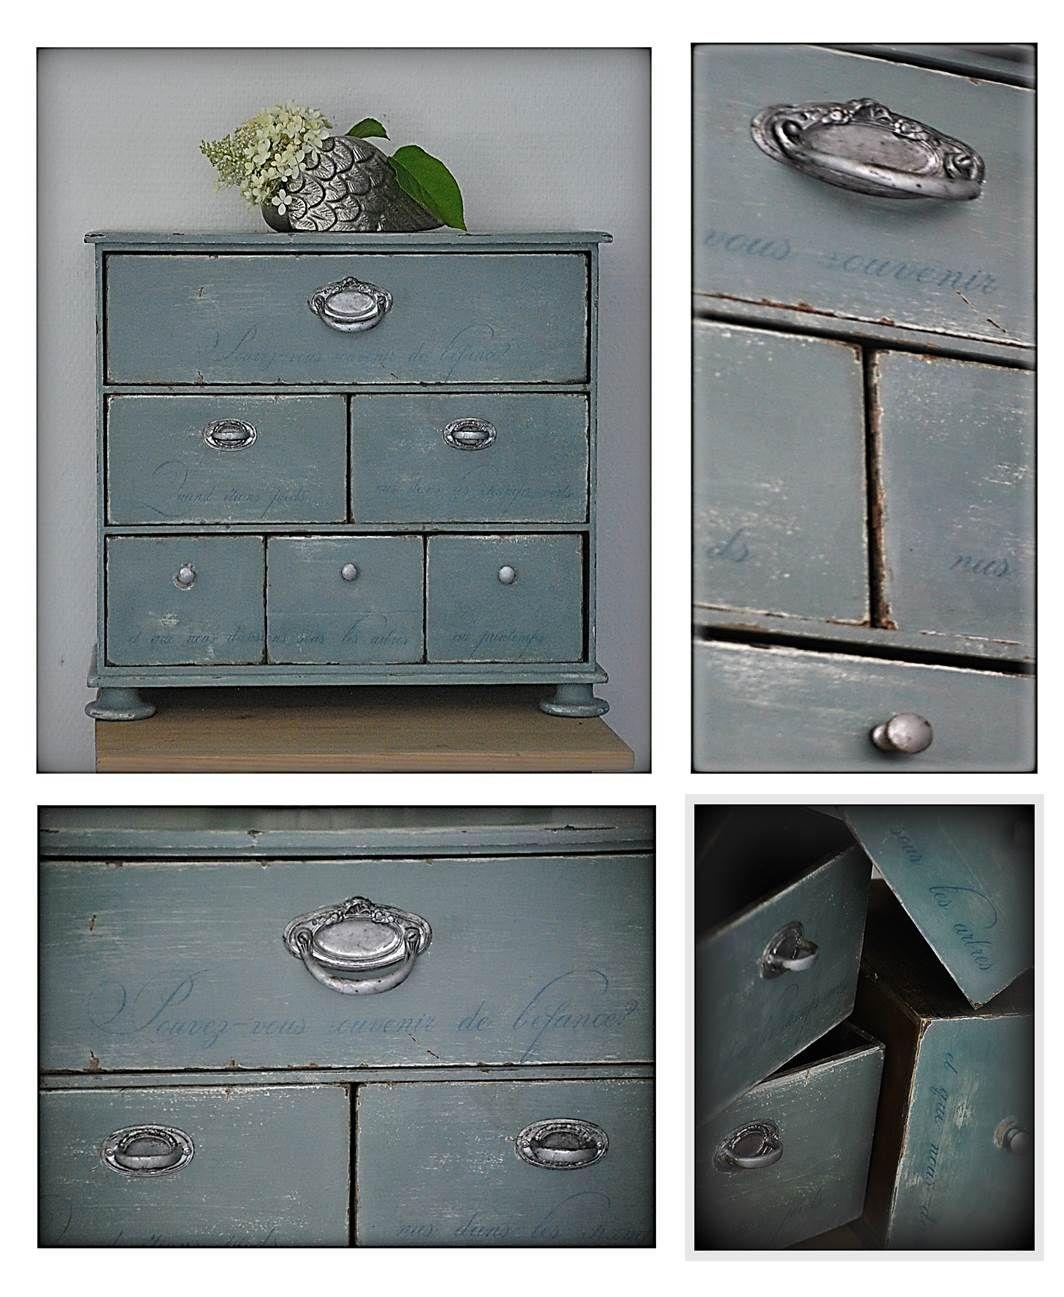 Ikea Hack Moppe Minikommode Annie Sloan Chalk Paint Craft Room